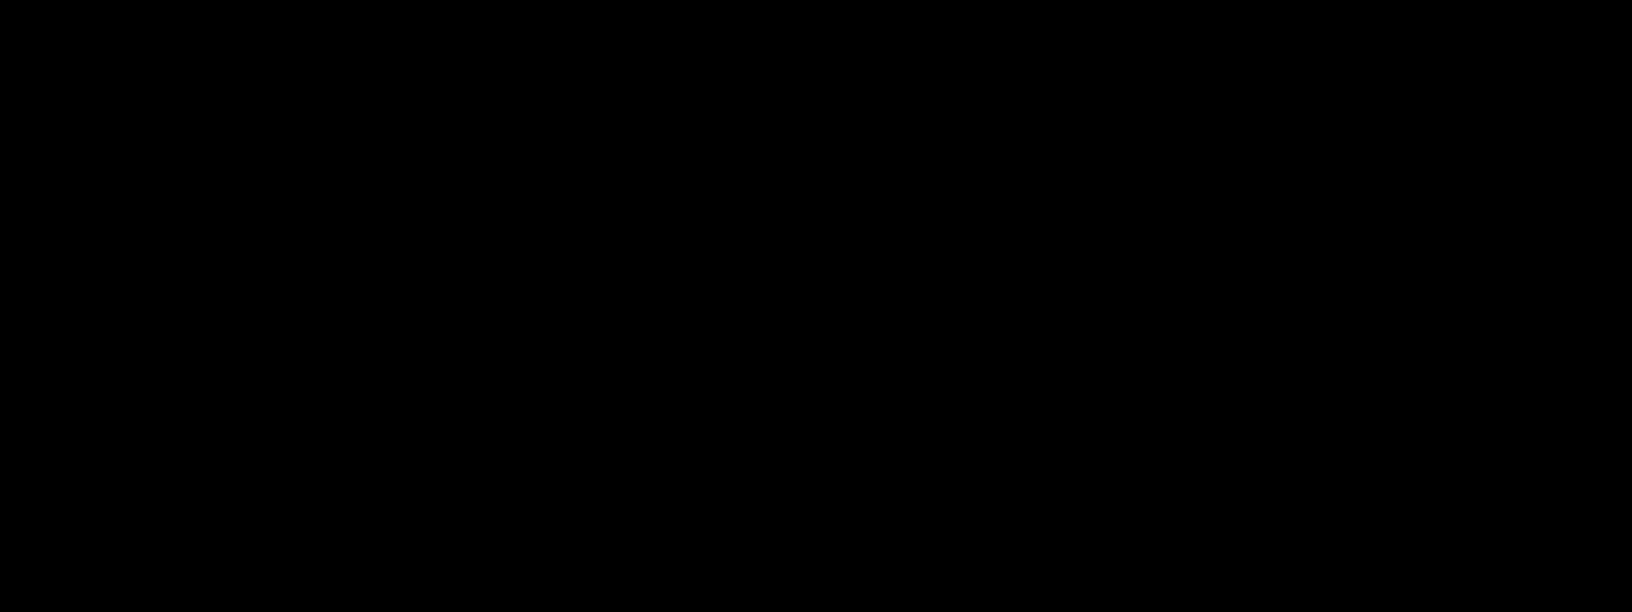 image129.png